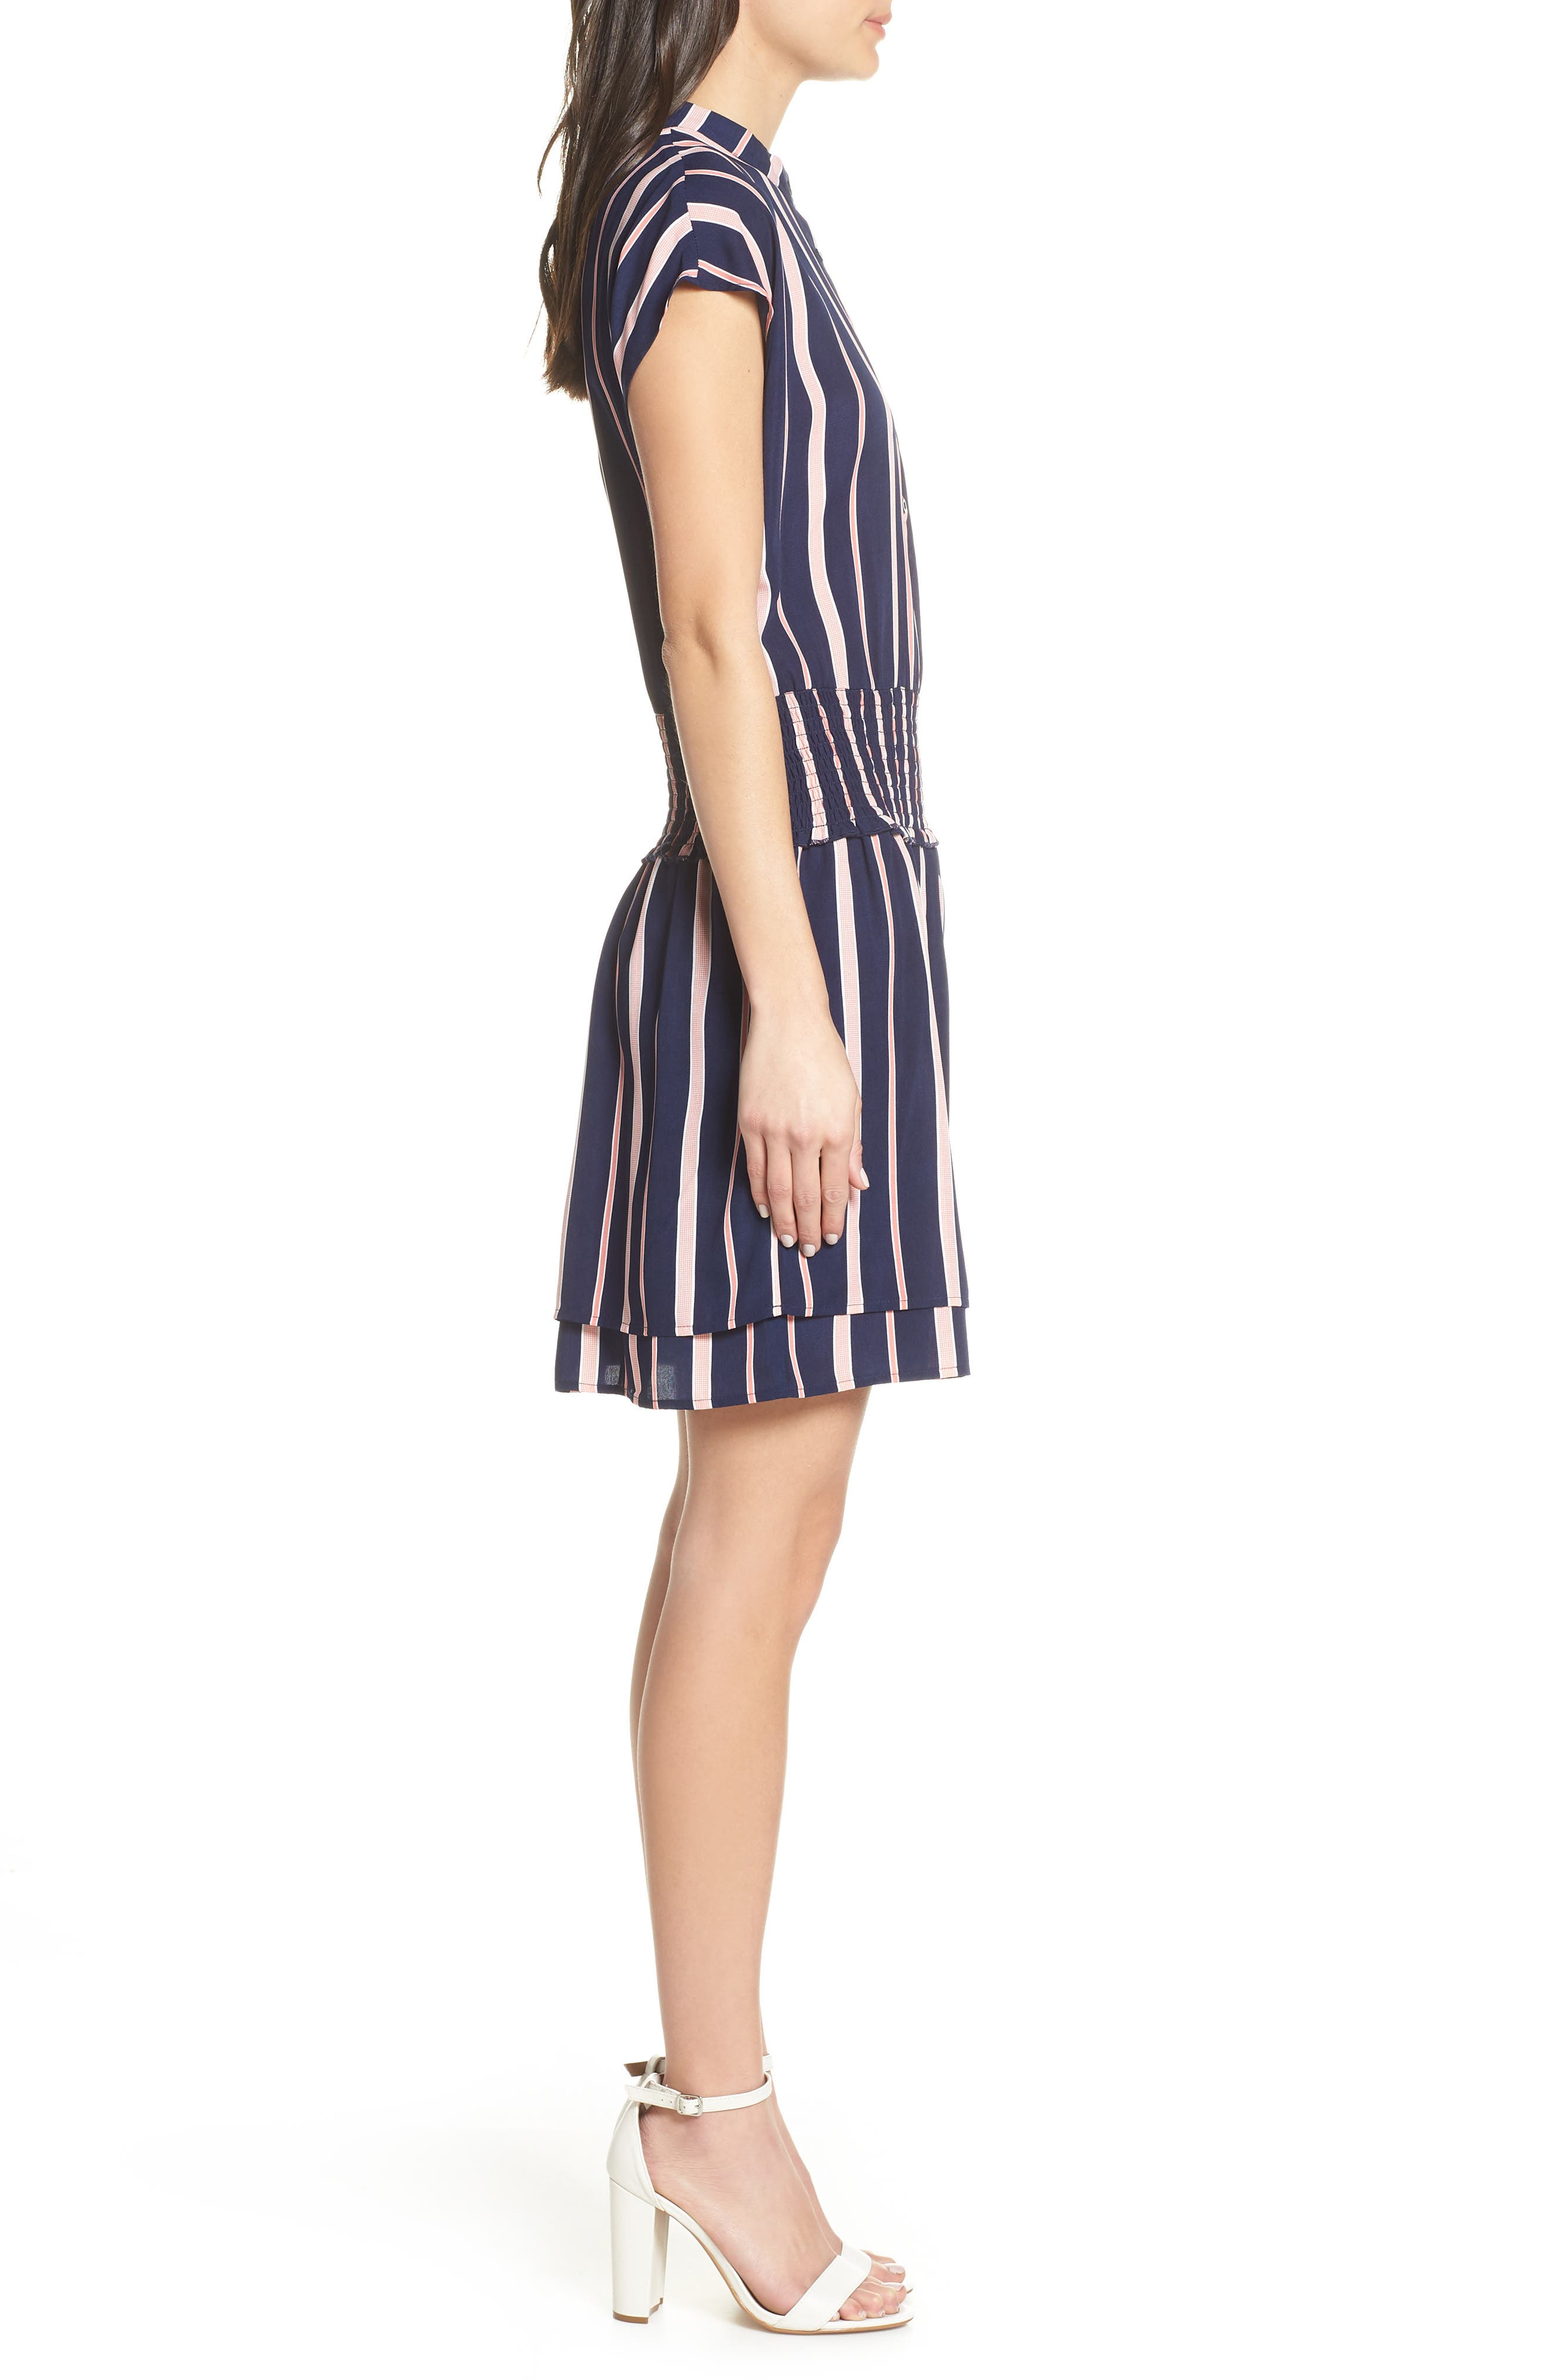 CHARLES HENRY, Smocked Stripe Dress, Alternate thumbnail 4, color, NAVY/ PINK STRIPE